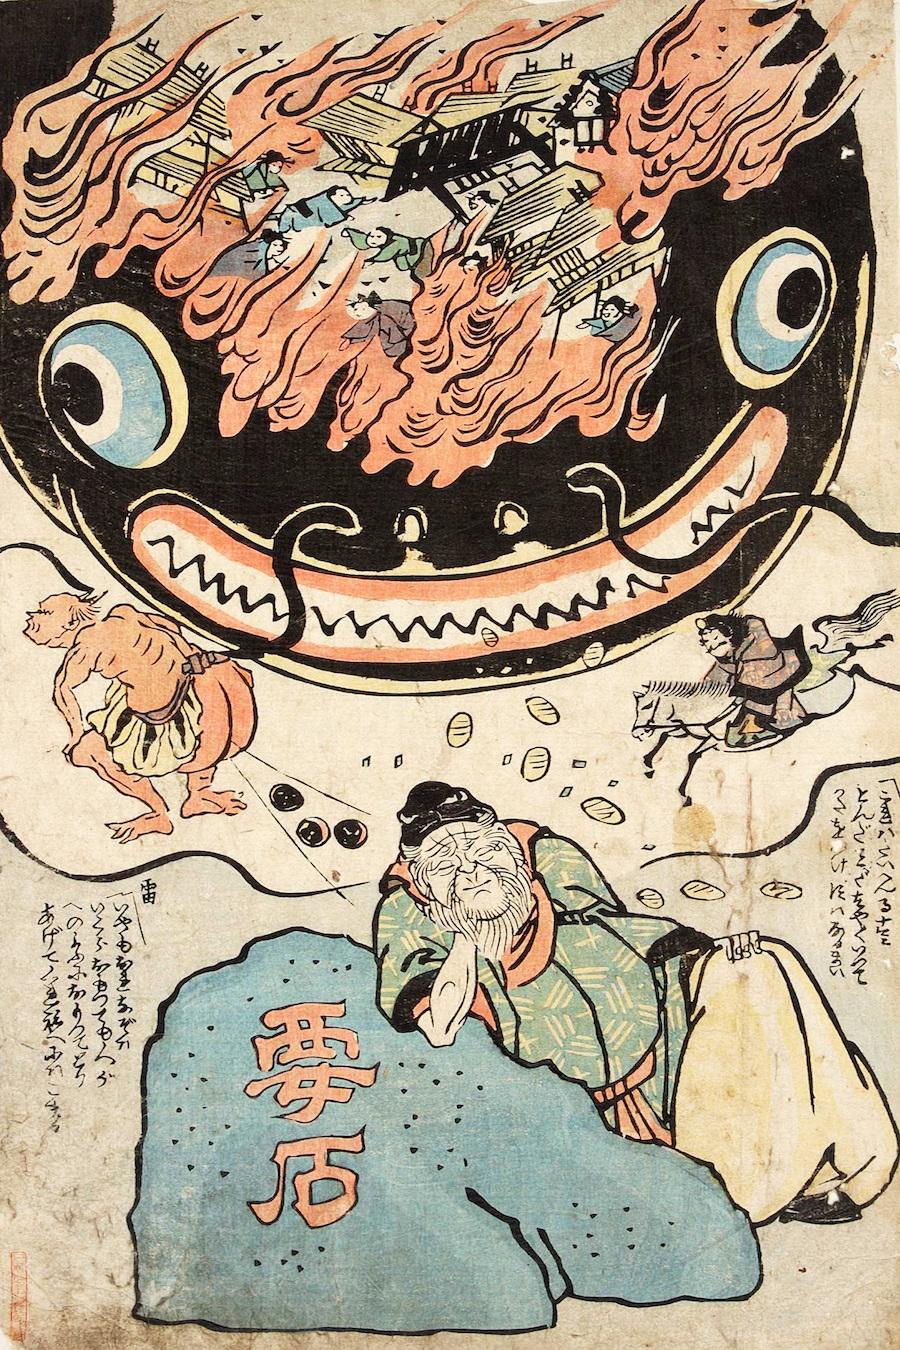 When Giant Catfish Shook The Earth: The Namazu-e Prints